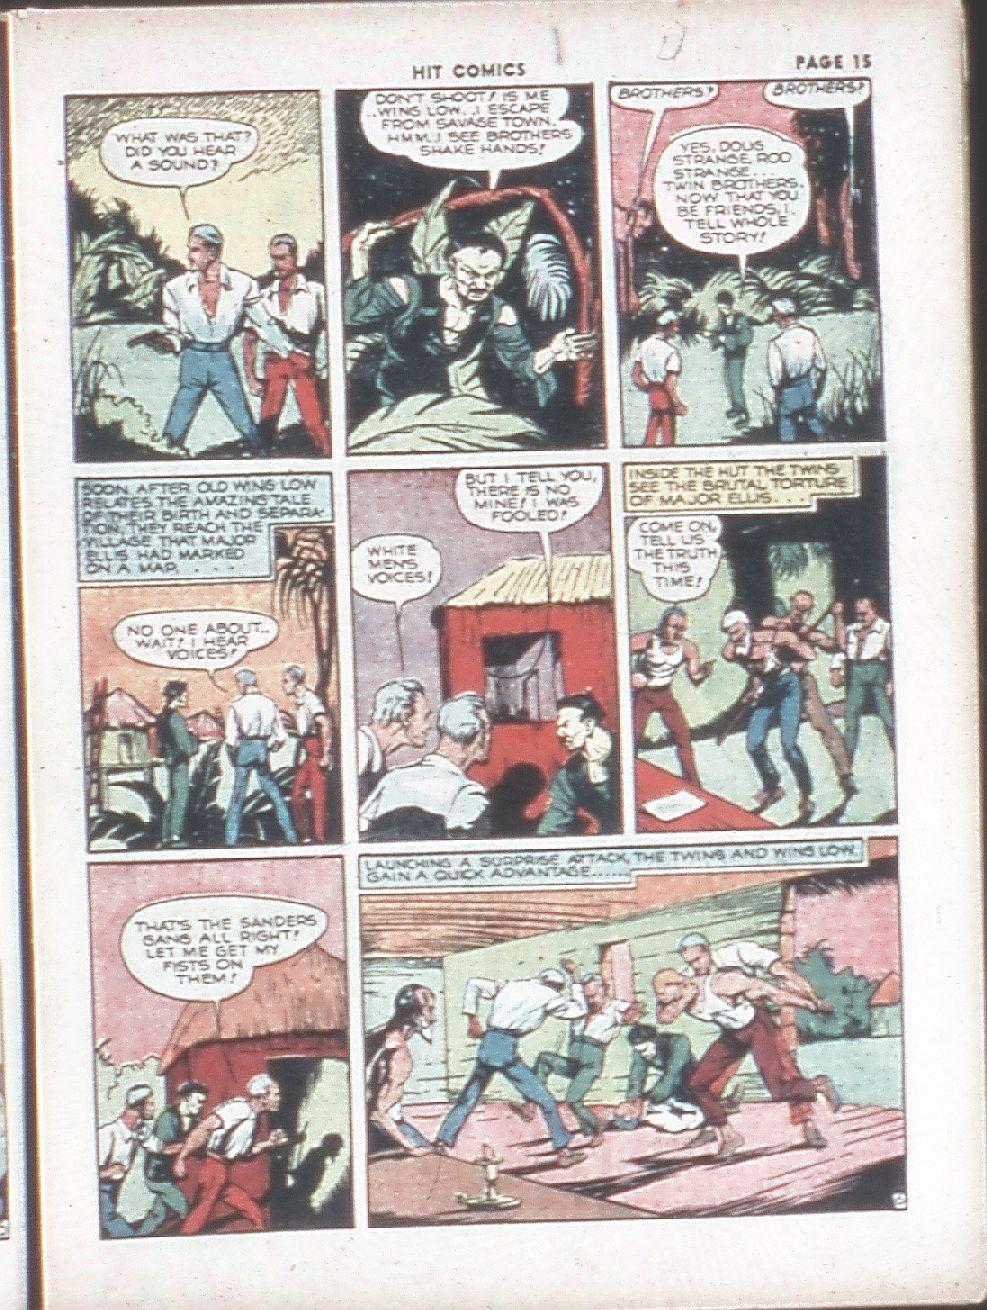 Read online Hit Comics comic -  Issue #7 - 17